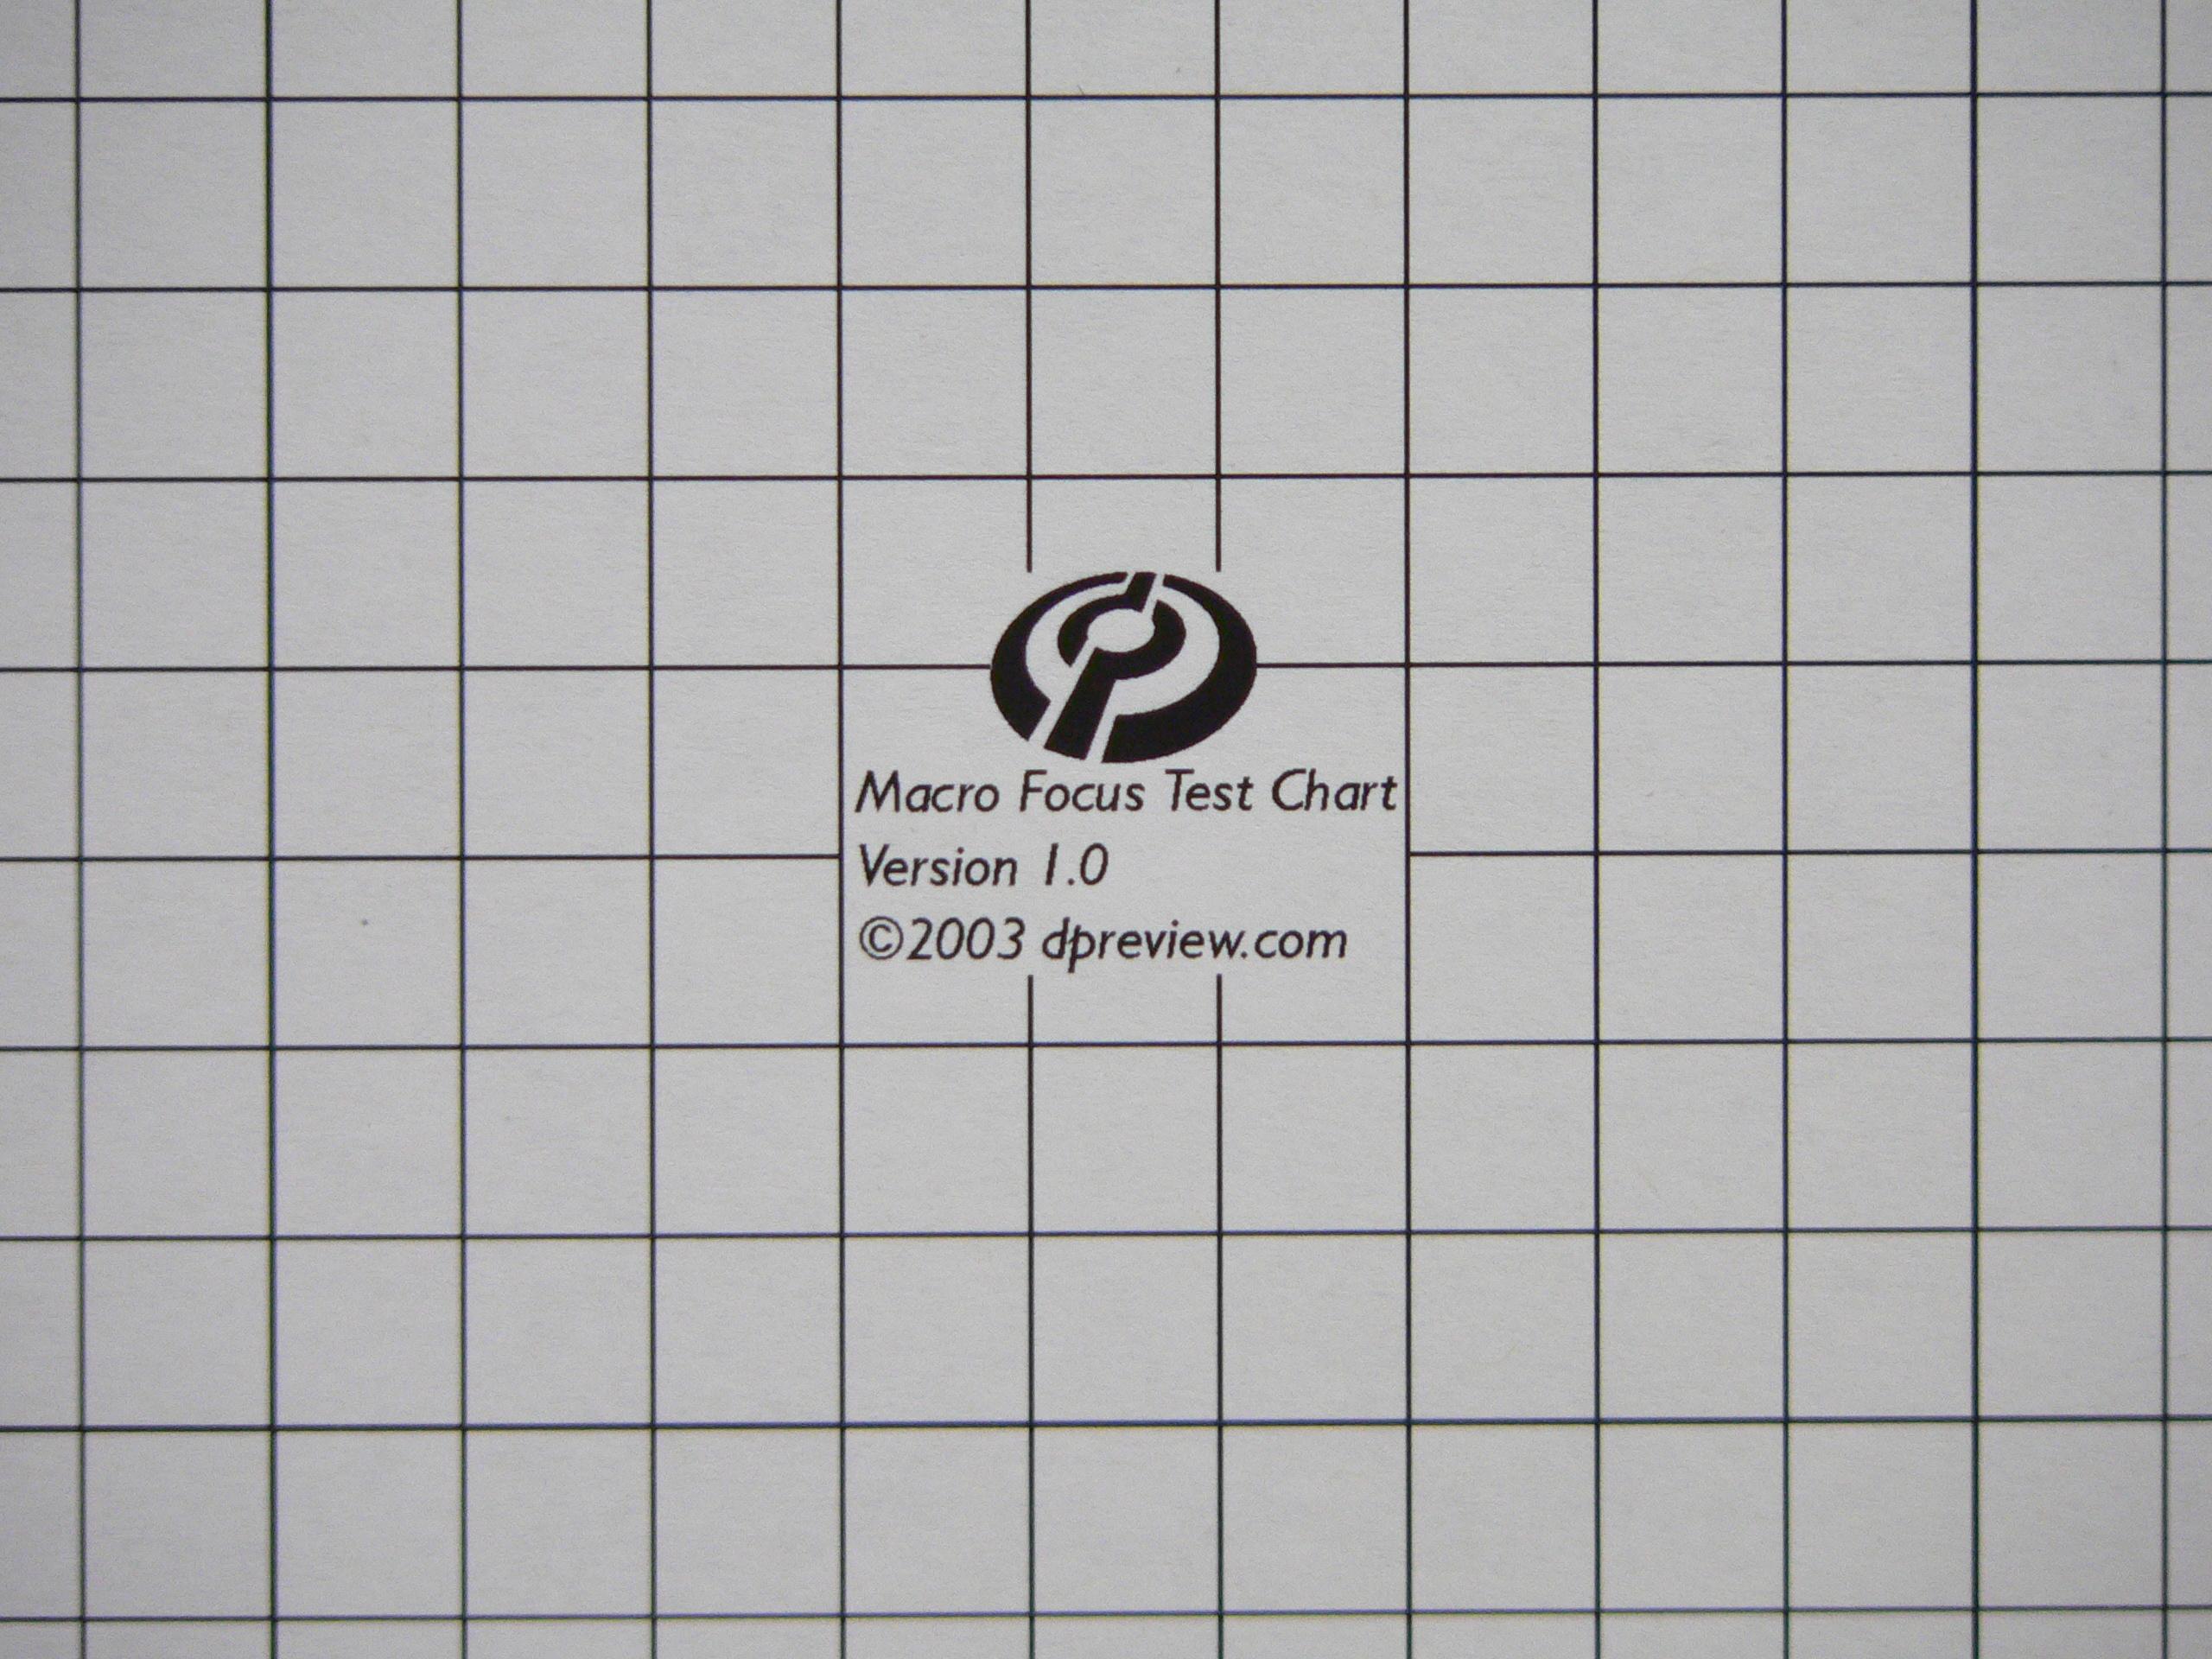 Panasonic Lumix DMC-FZ20 Review: Digital Photography Review